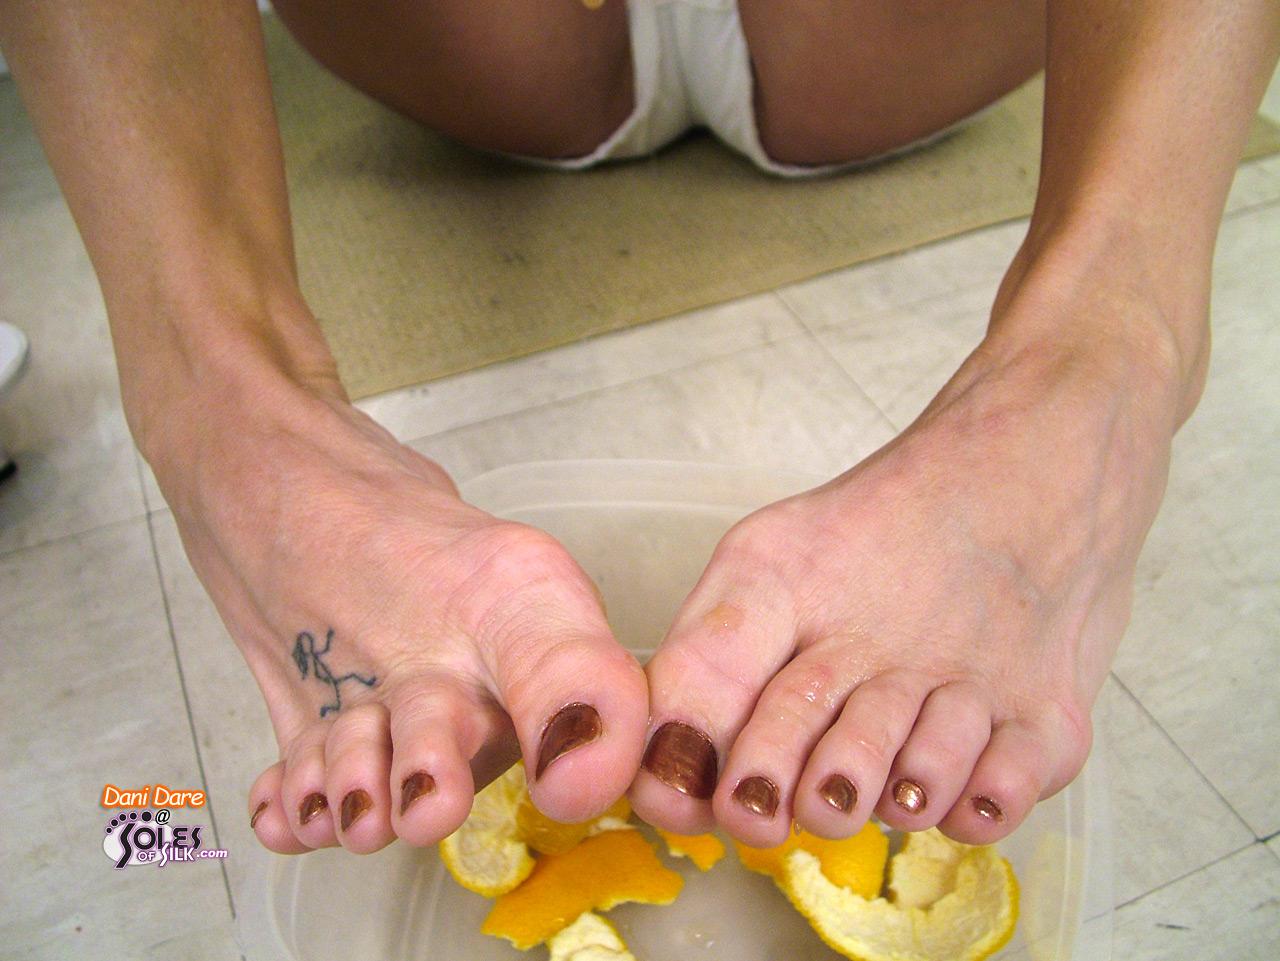 Canadian milf dani dare fingers her holes in nylon 10